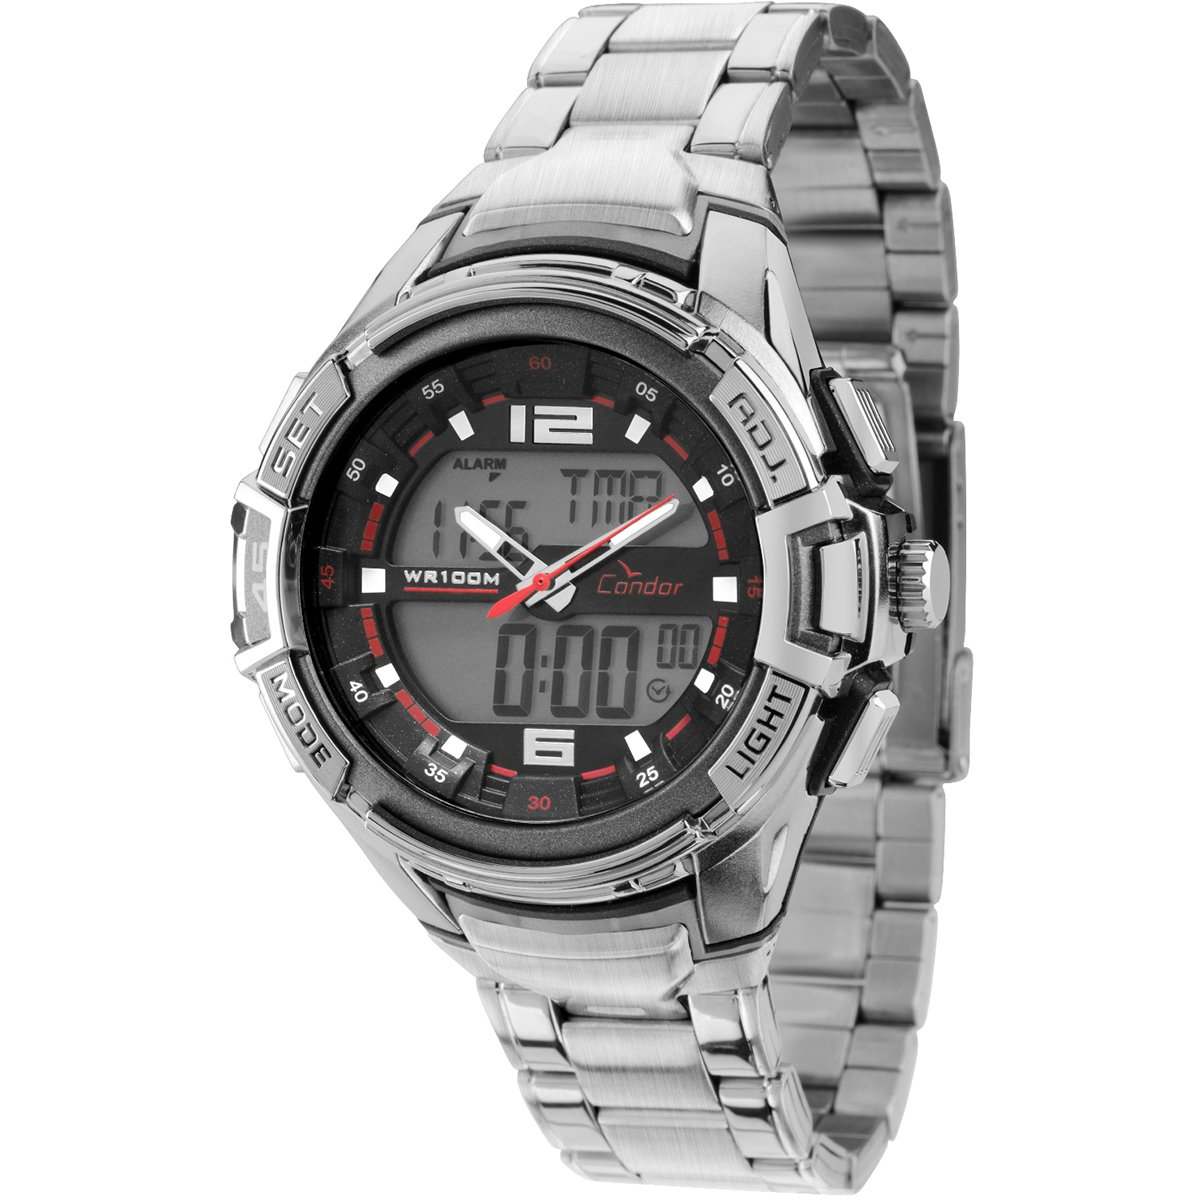 Relógio Condor Anadigi - Compre Agora   Netshoes 9d02824536